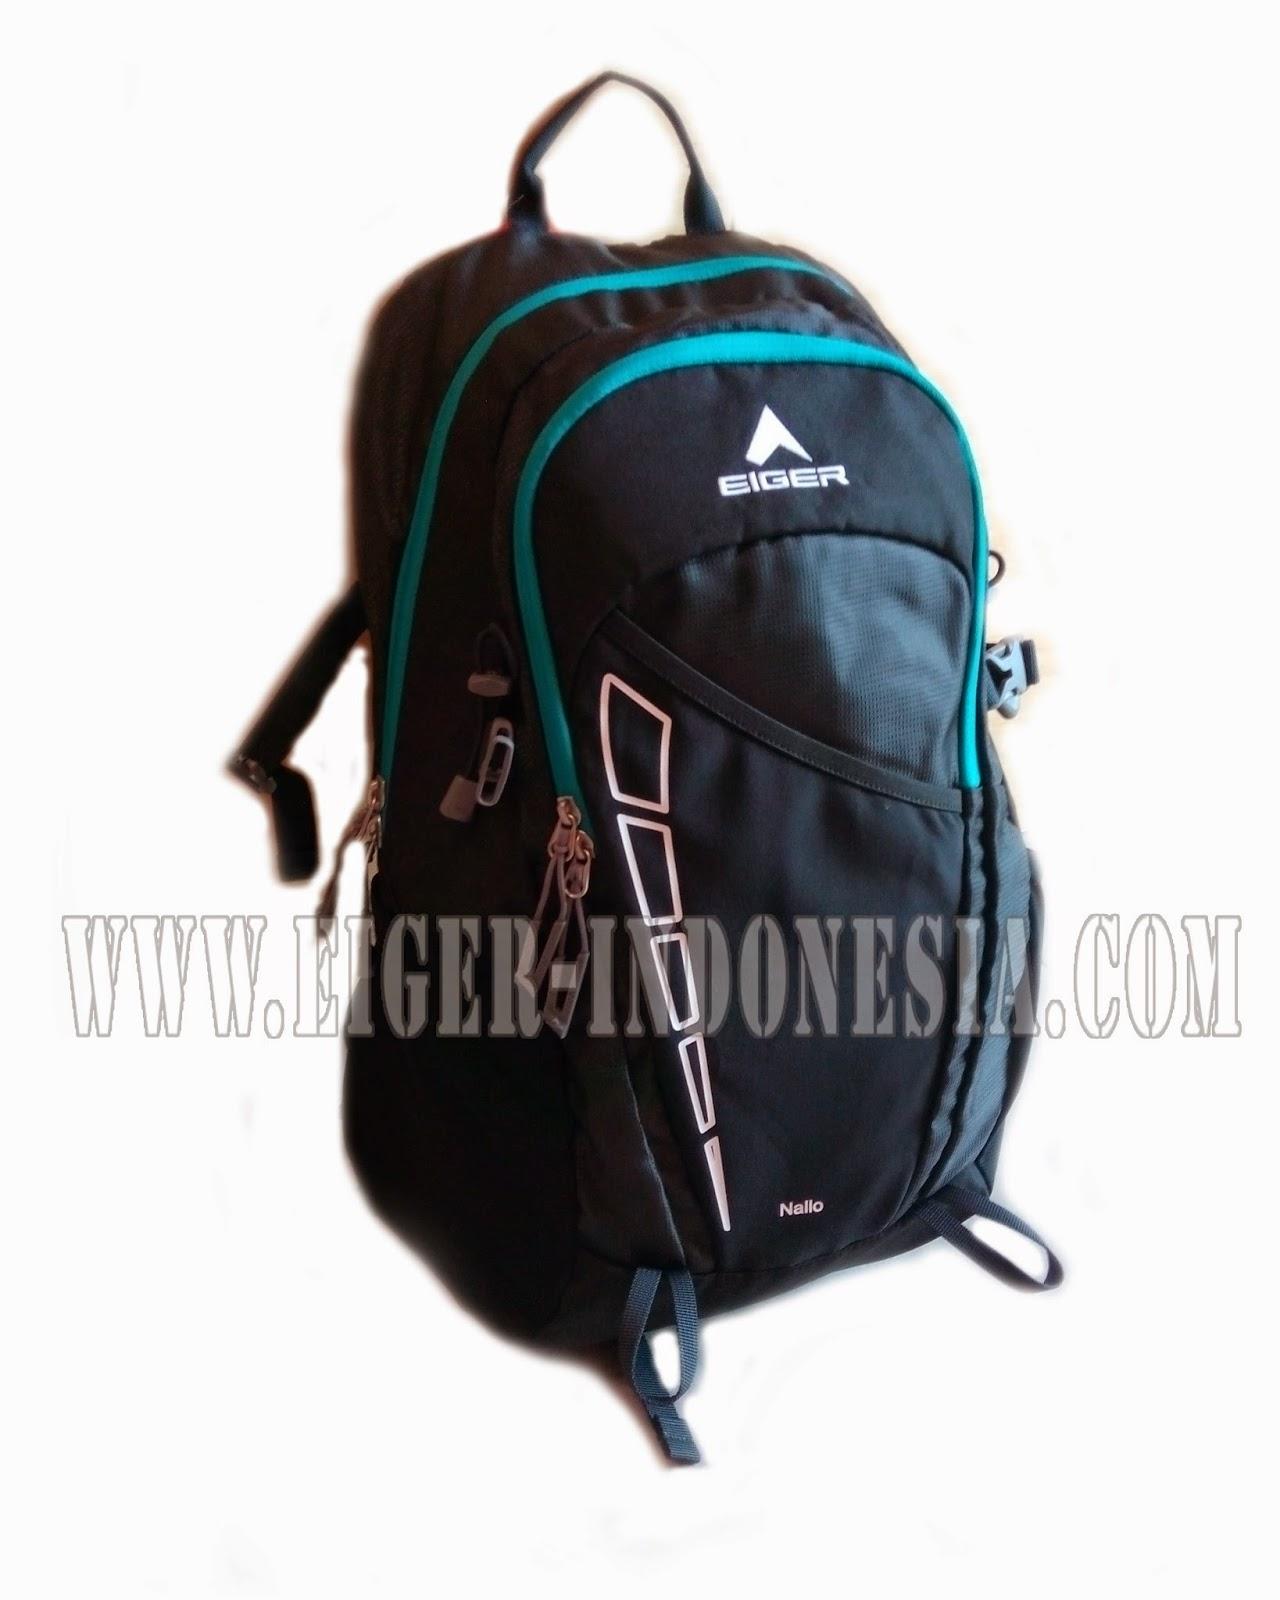 http://www.eiger-indonesia.com/2014/11/tas-eiger-2307-nallo.html